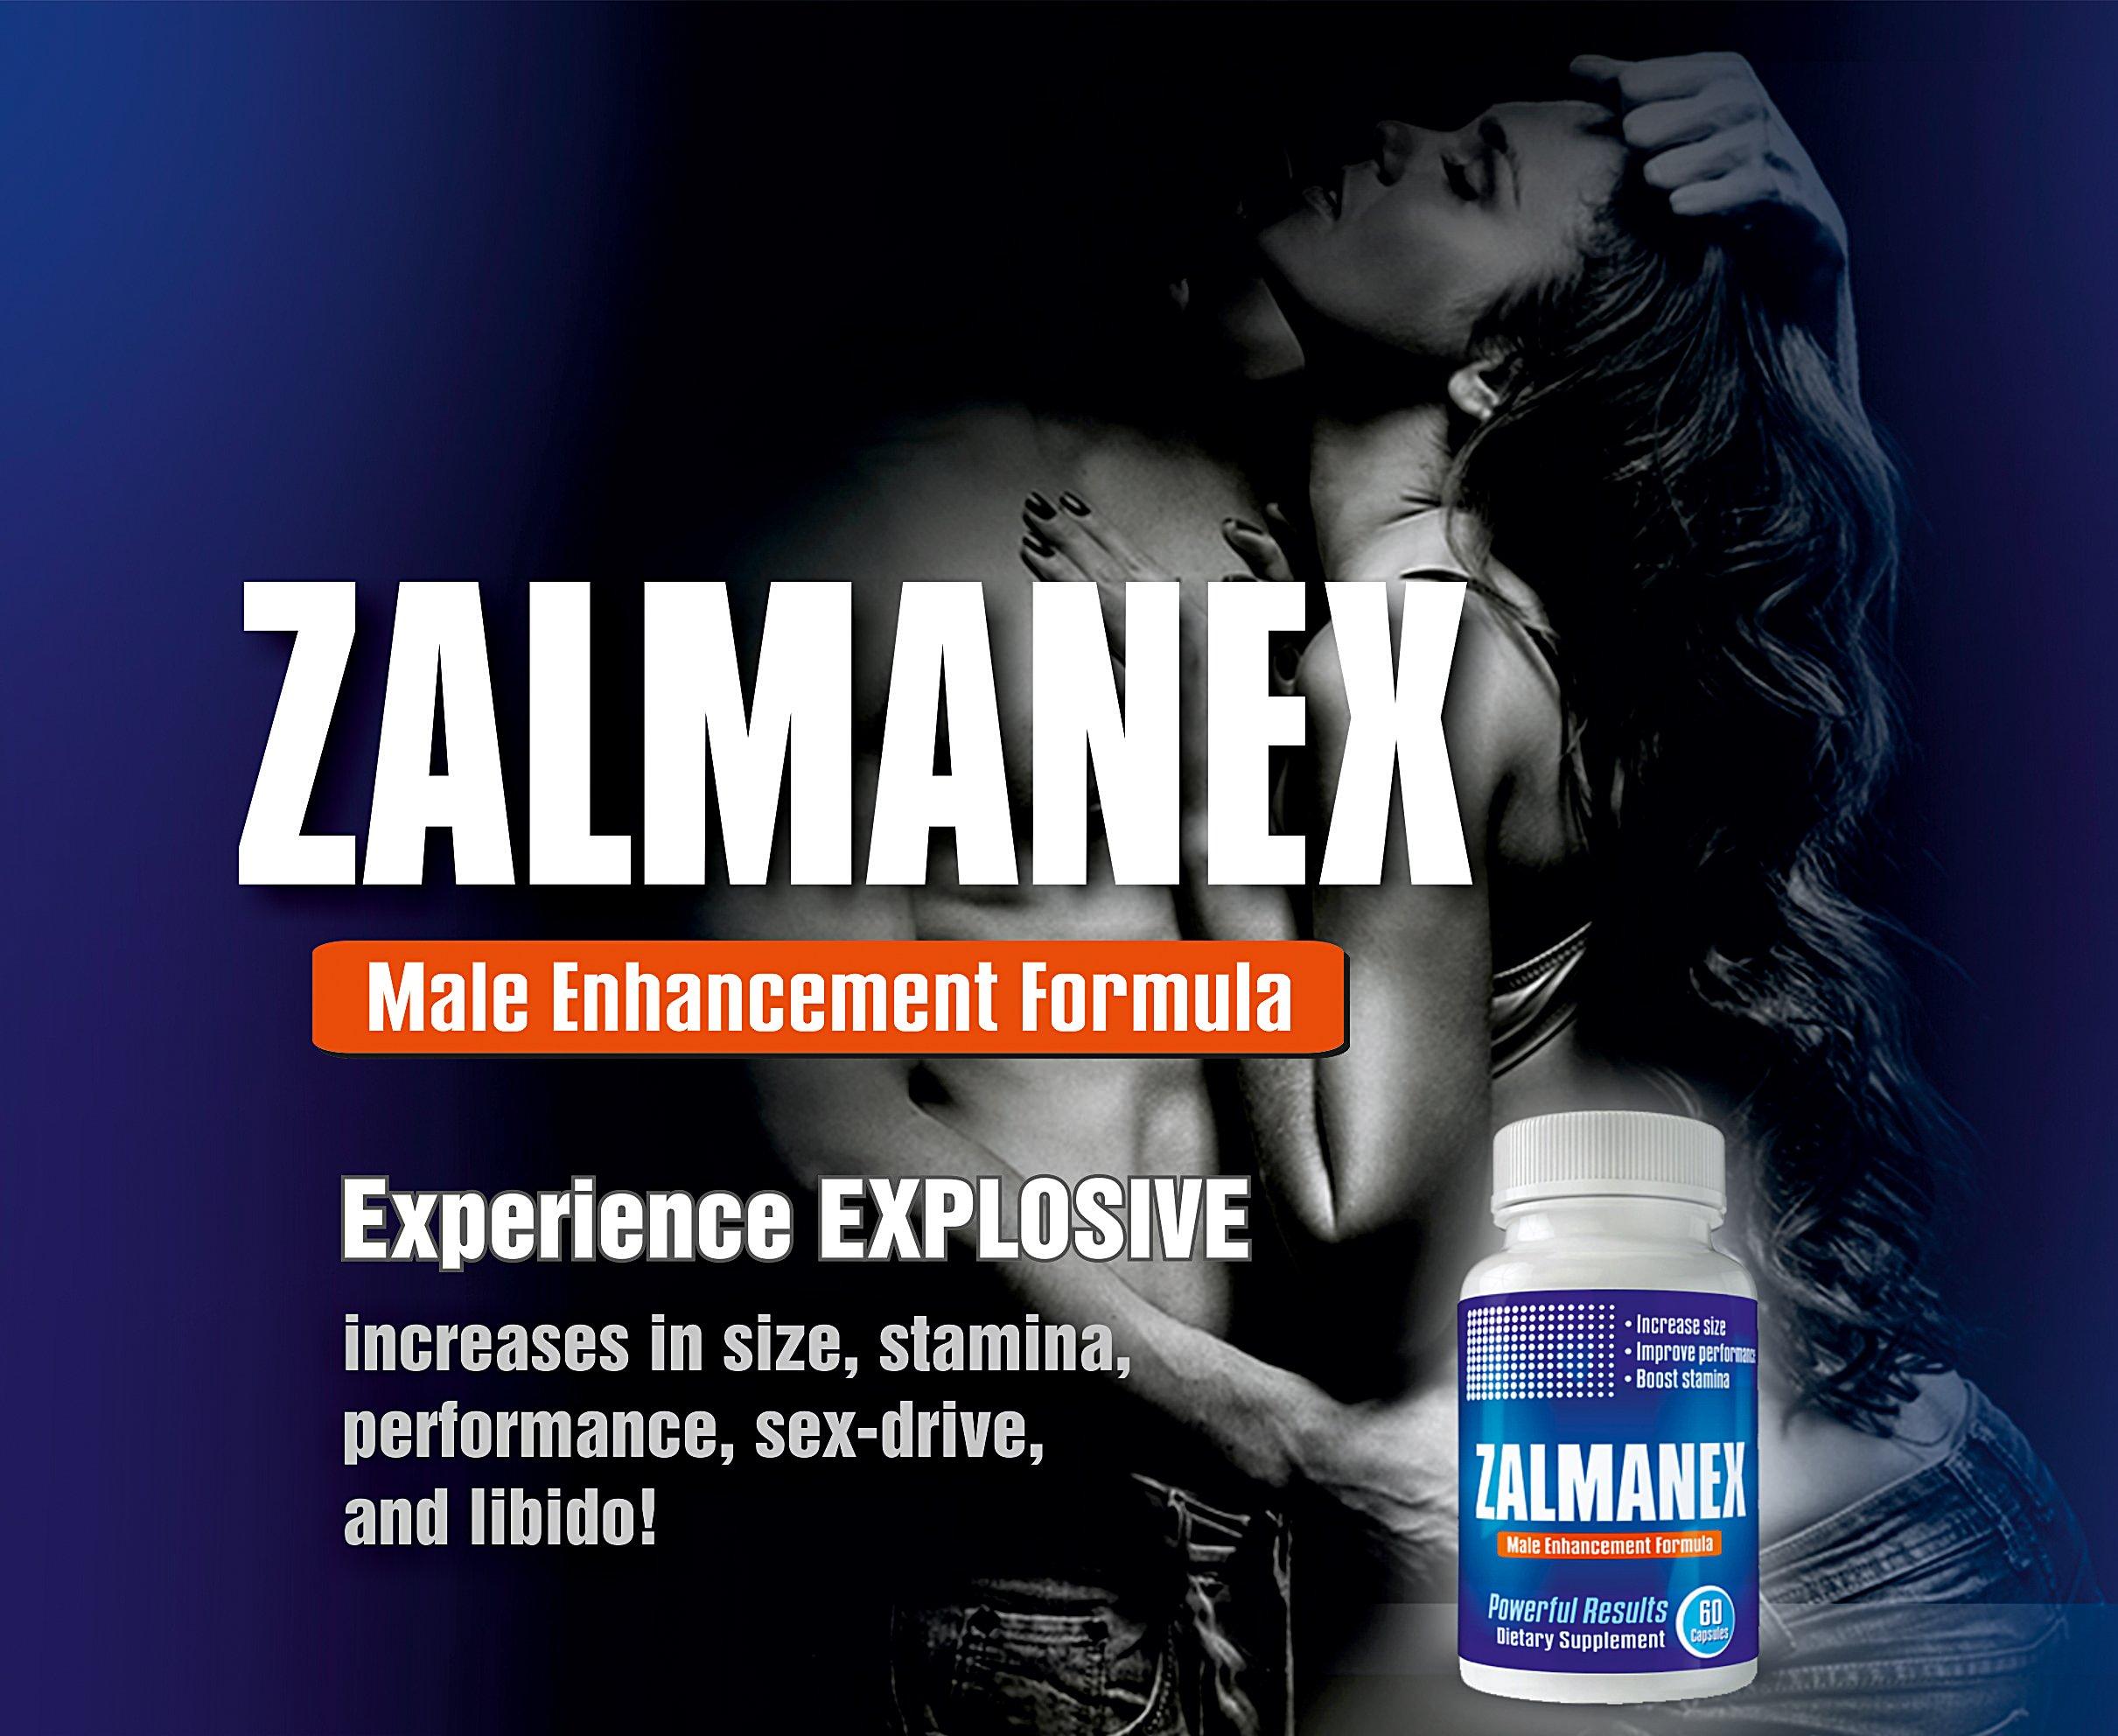 Zalmanex Male Enhancement Pills - Enlargement Pills for Men - Male Performance Pills - Increase Size, Stamina, Sex-Drive - Erection Pills - Testosterone Booster - Muira Puama, Tongkat Ali